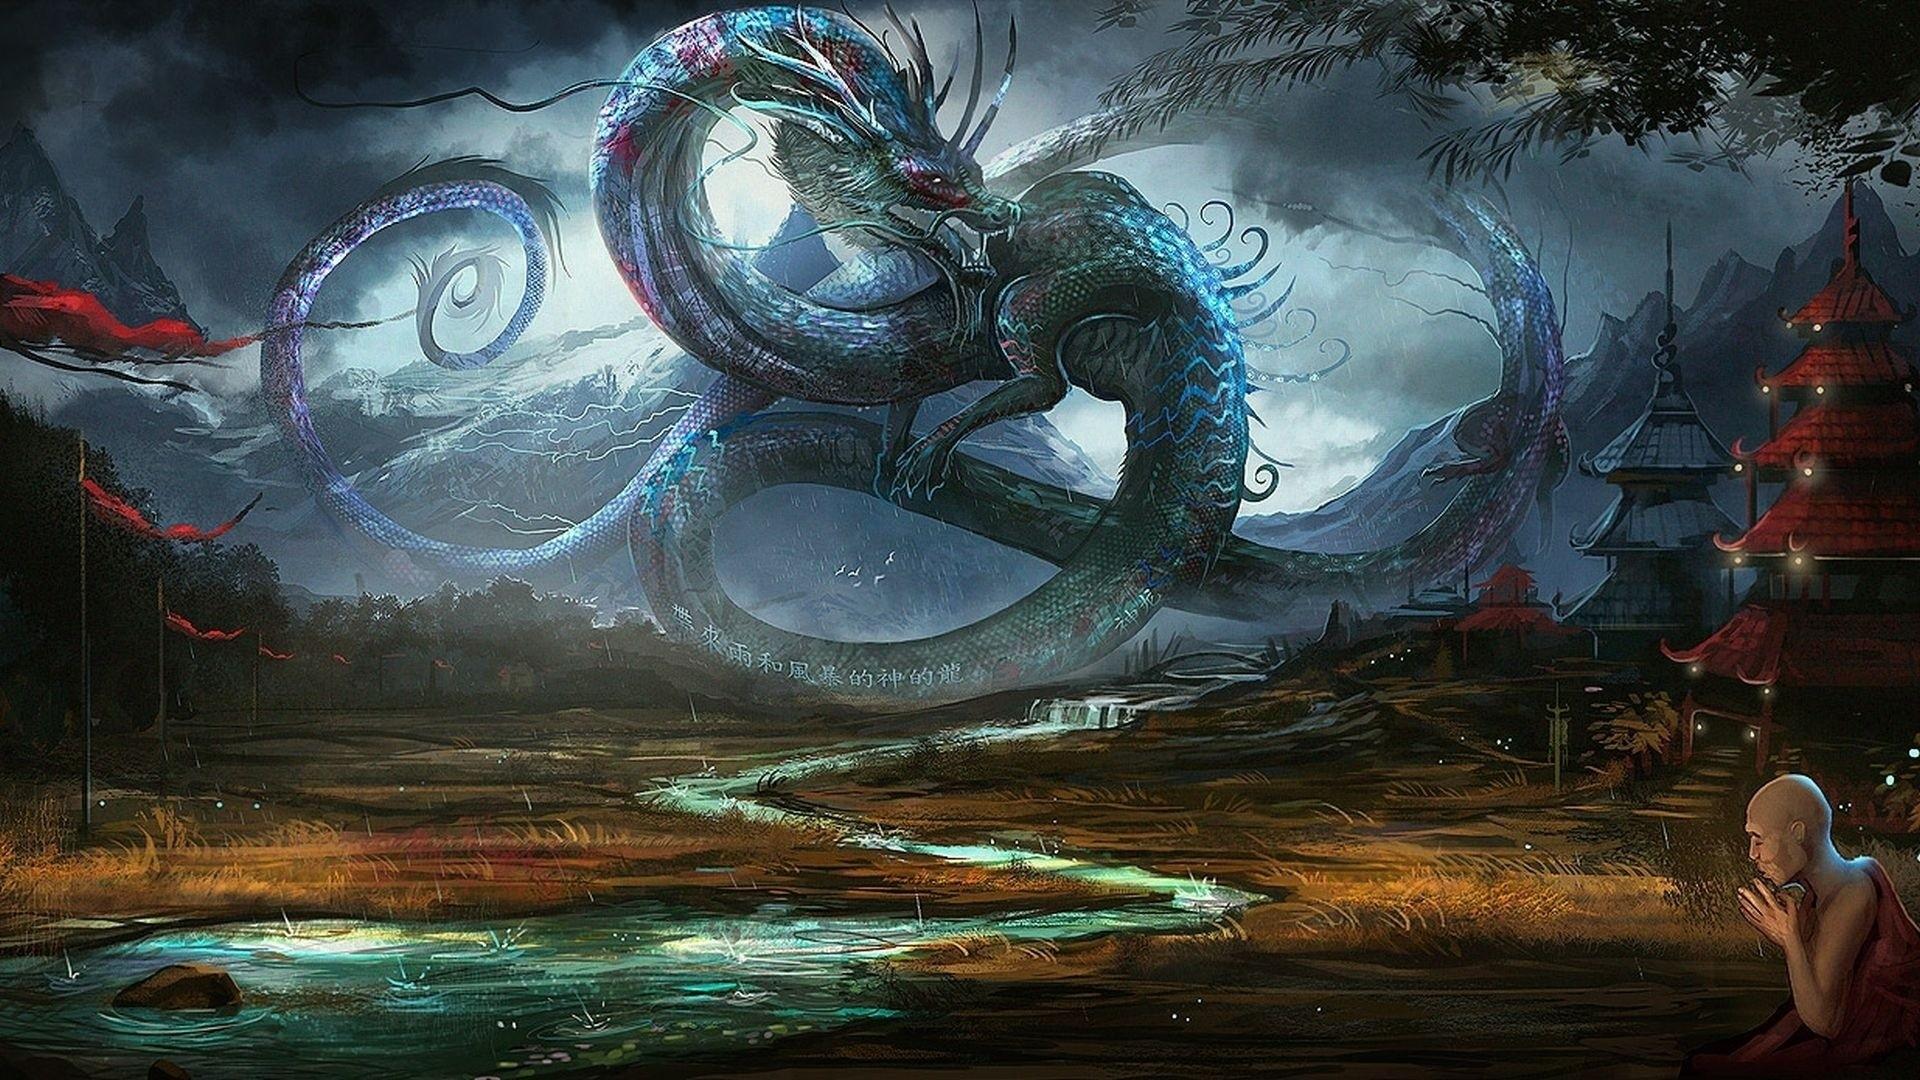 Black Dragon Wallpapers HD Group